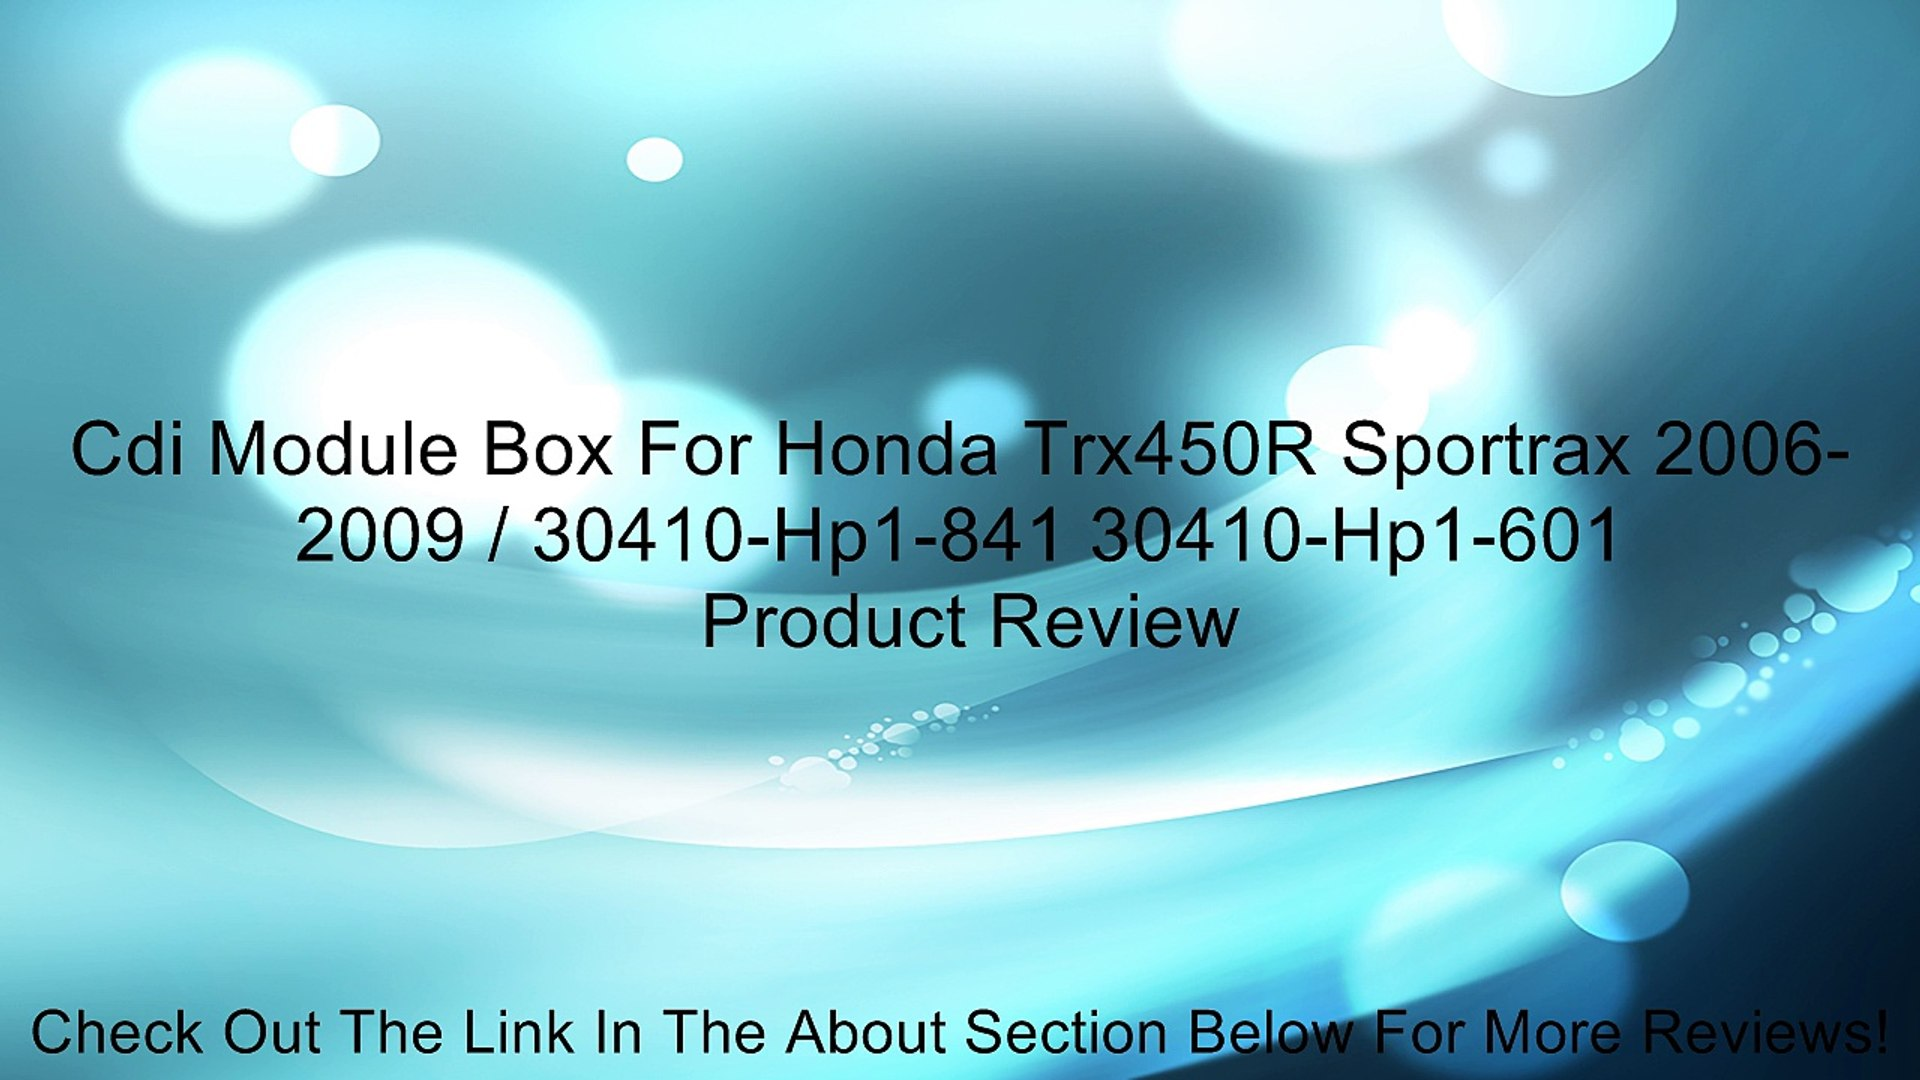 TRX400EX 05 06 07 08 30410-HN1-A41 CDI MODULE BOX For Honda ATV TRX400X 2009